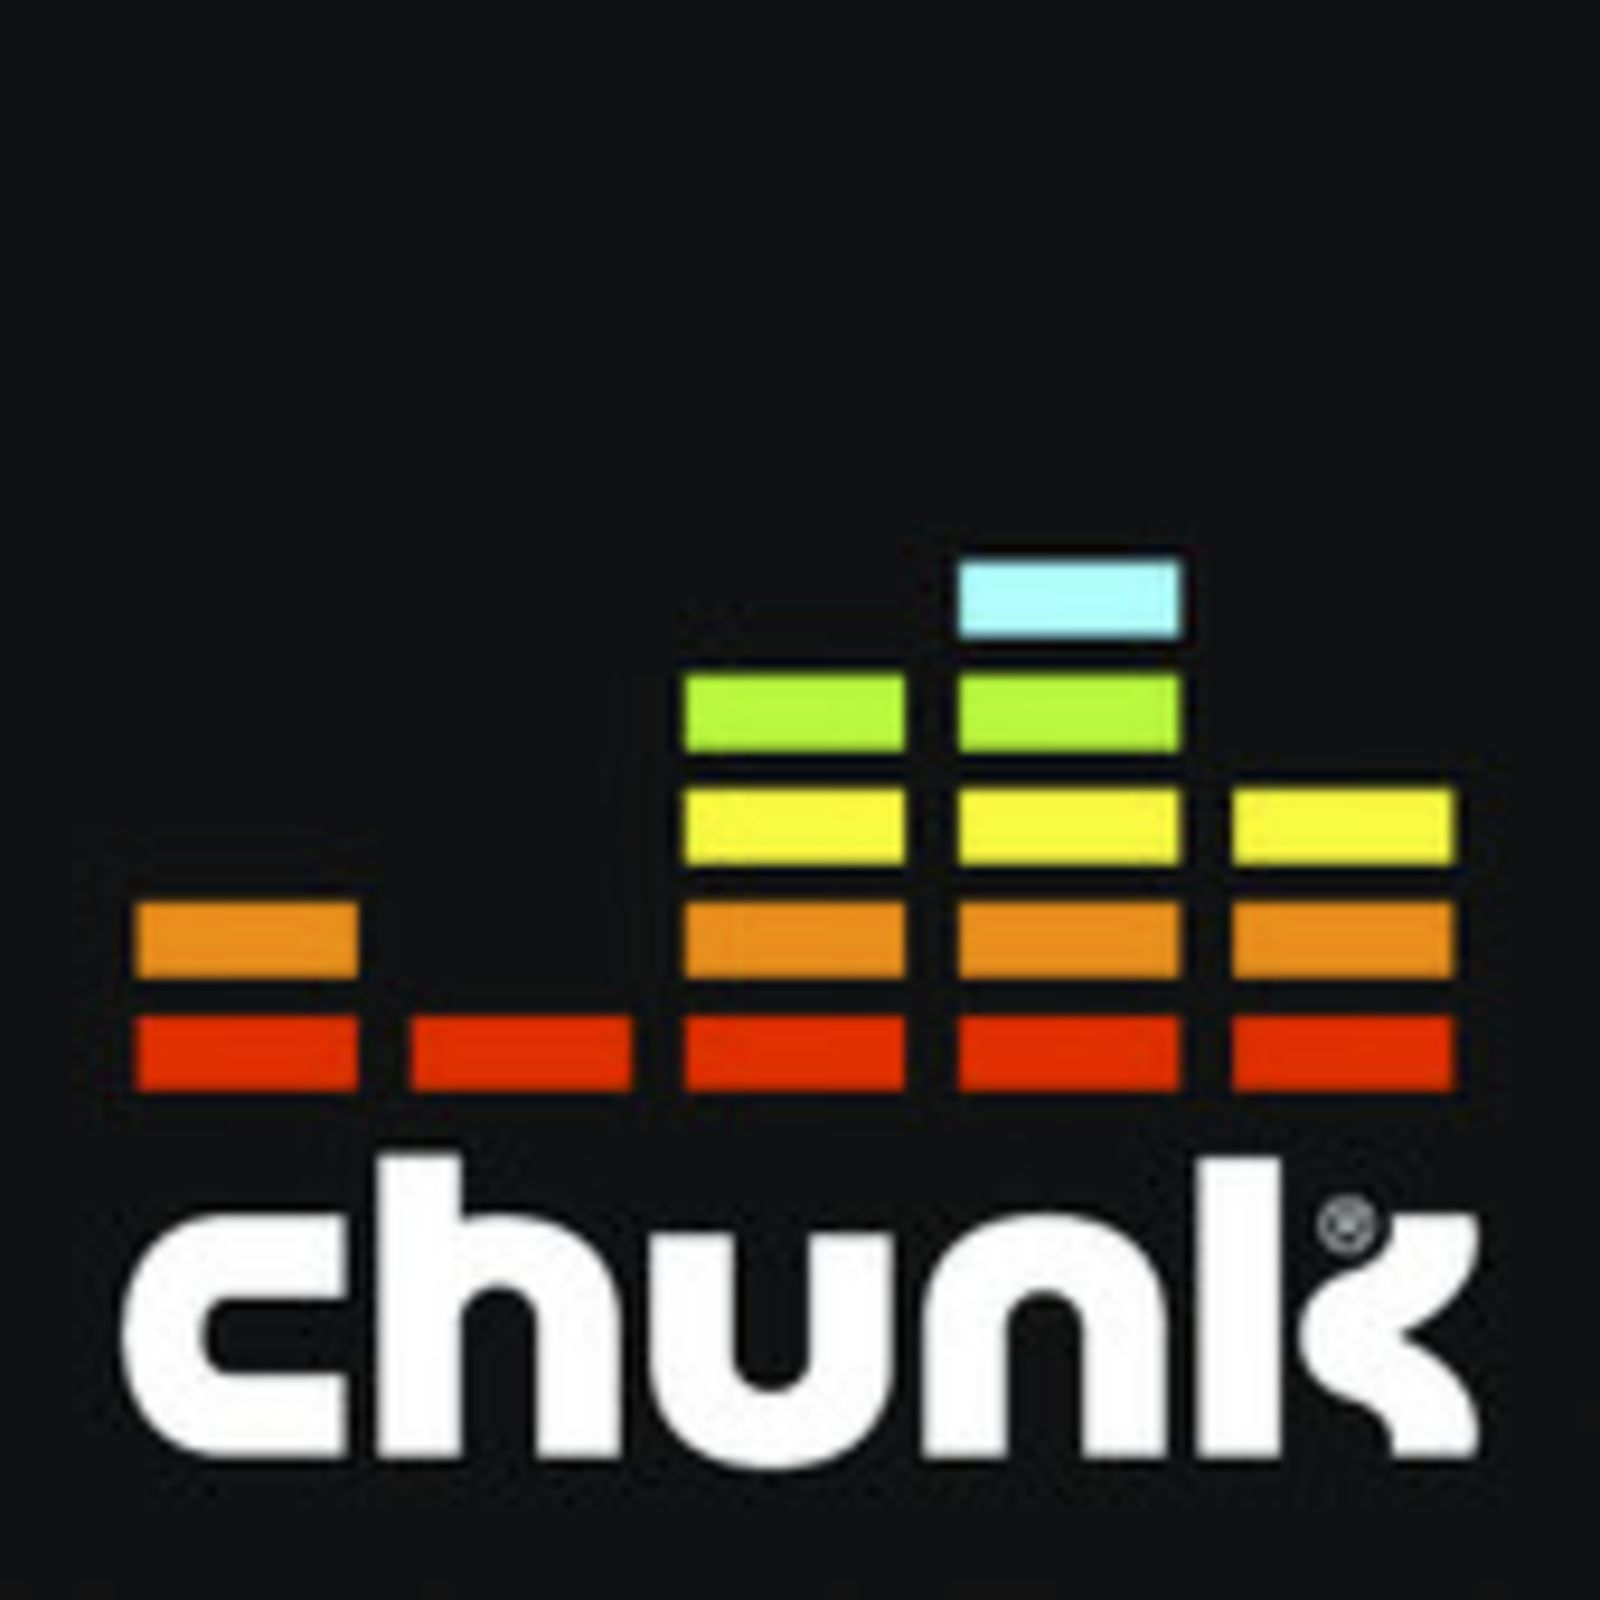 CNK CHUNK